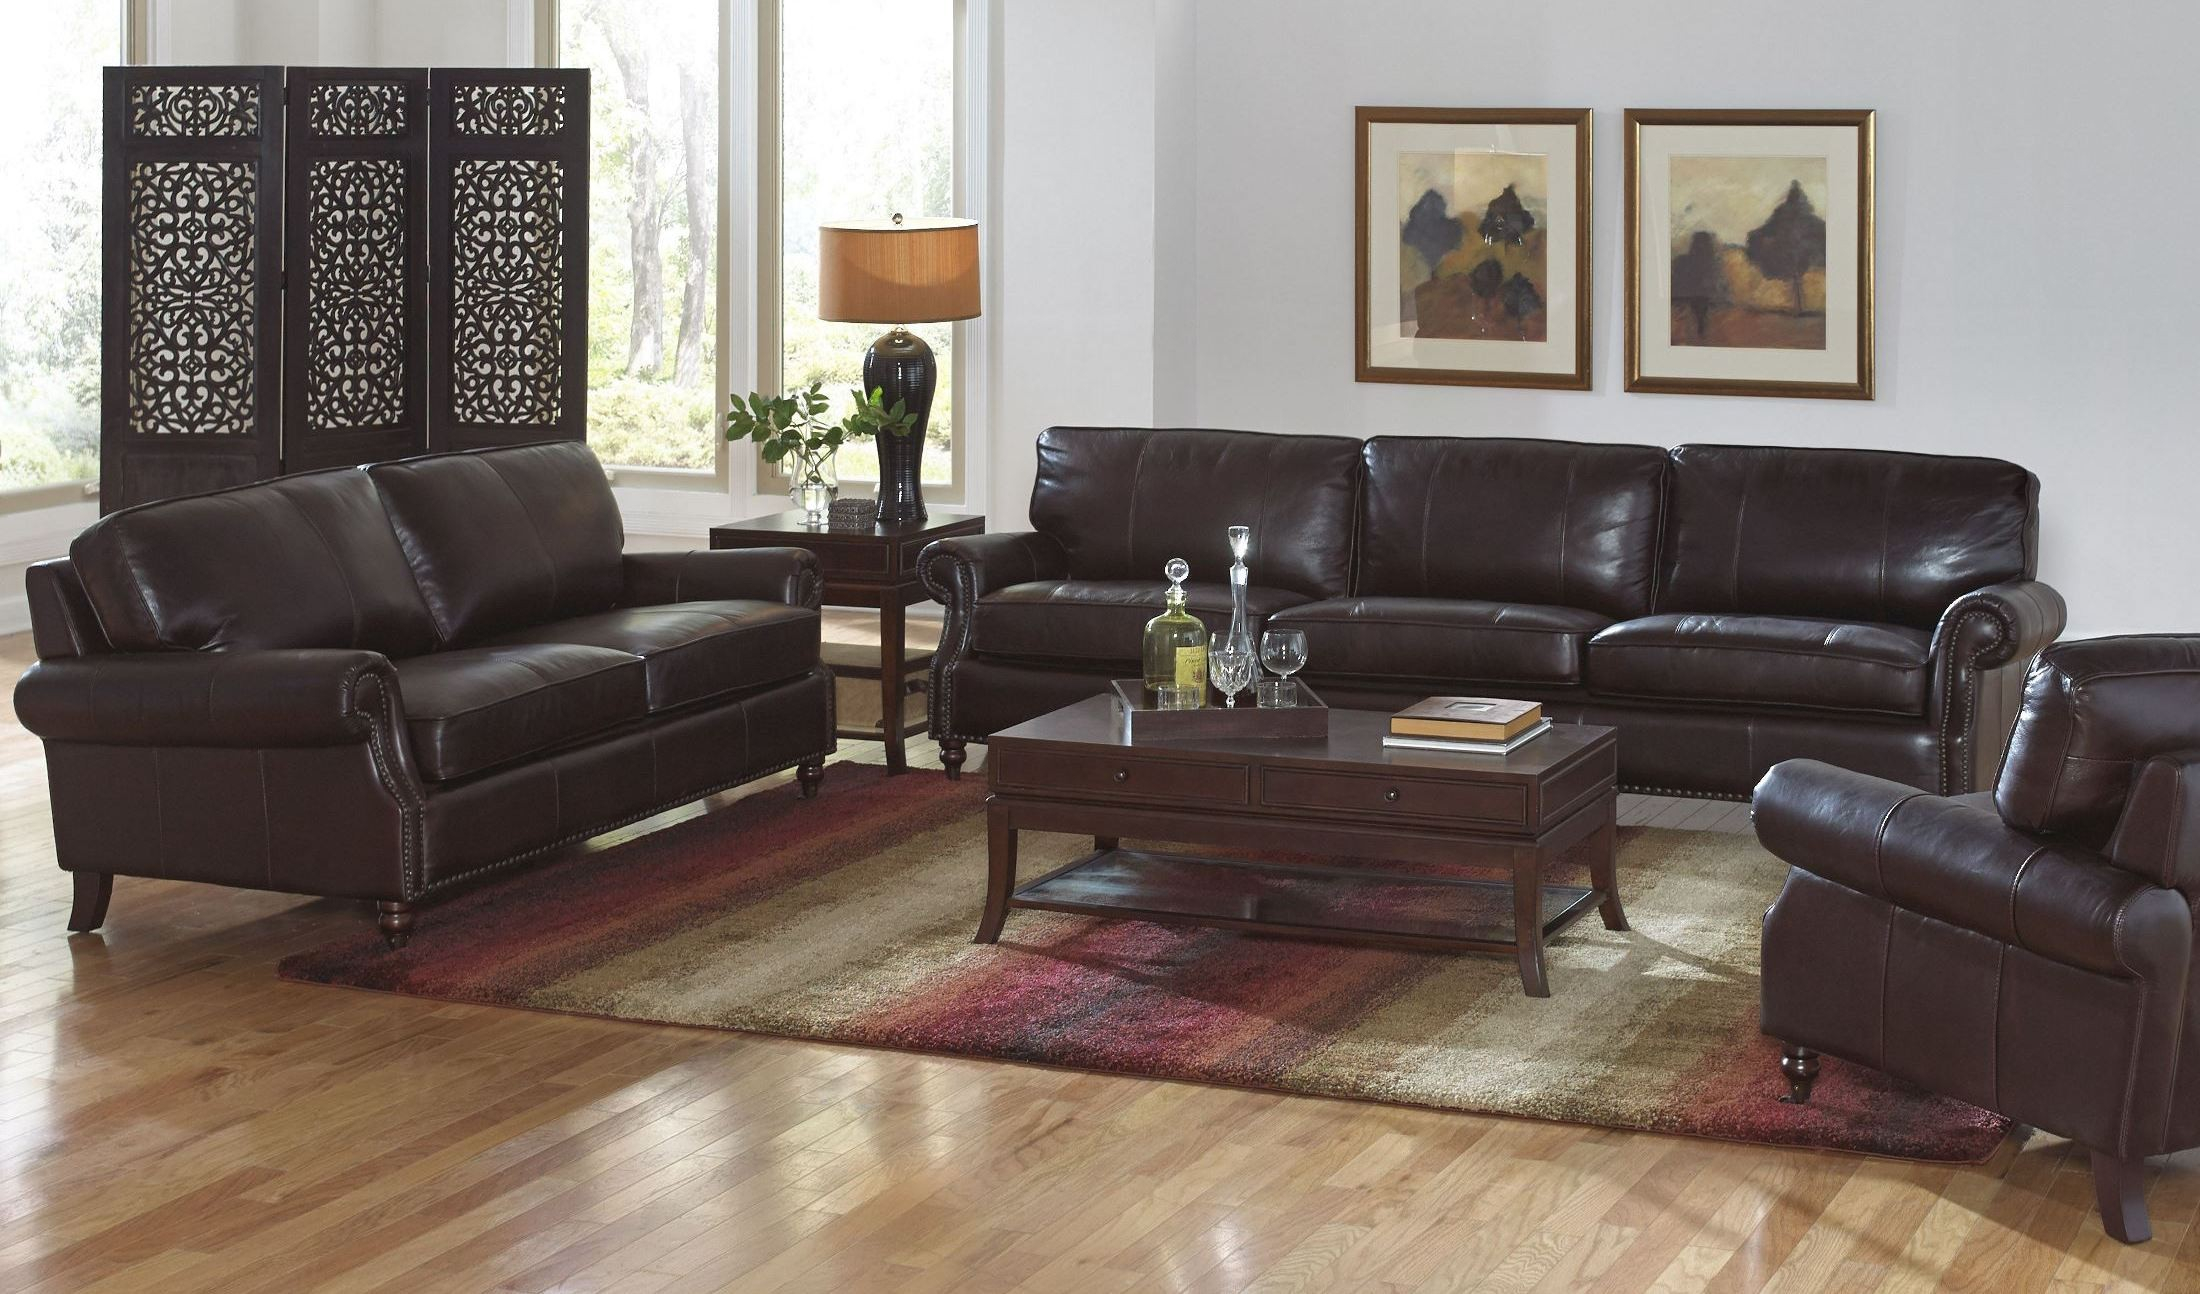 Stockton dark chocolate leather living room set from - Chocolate leather living room furniture ...